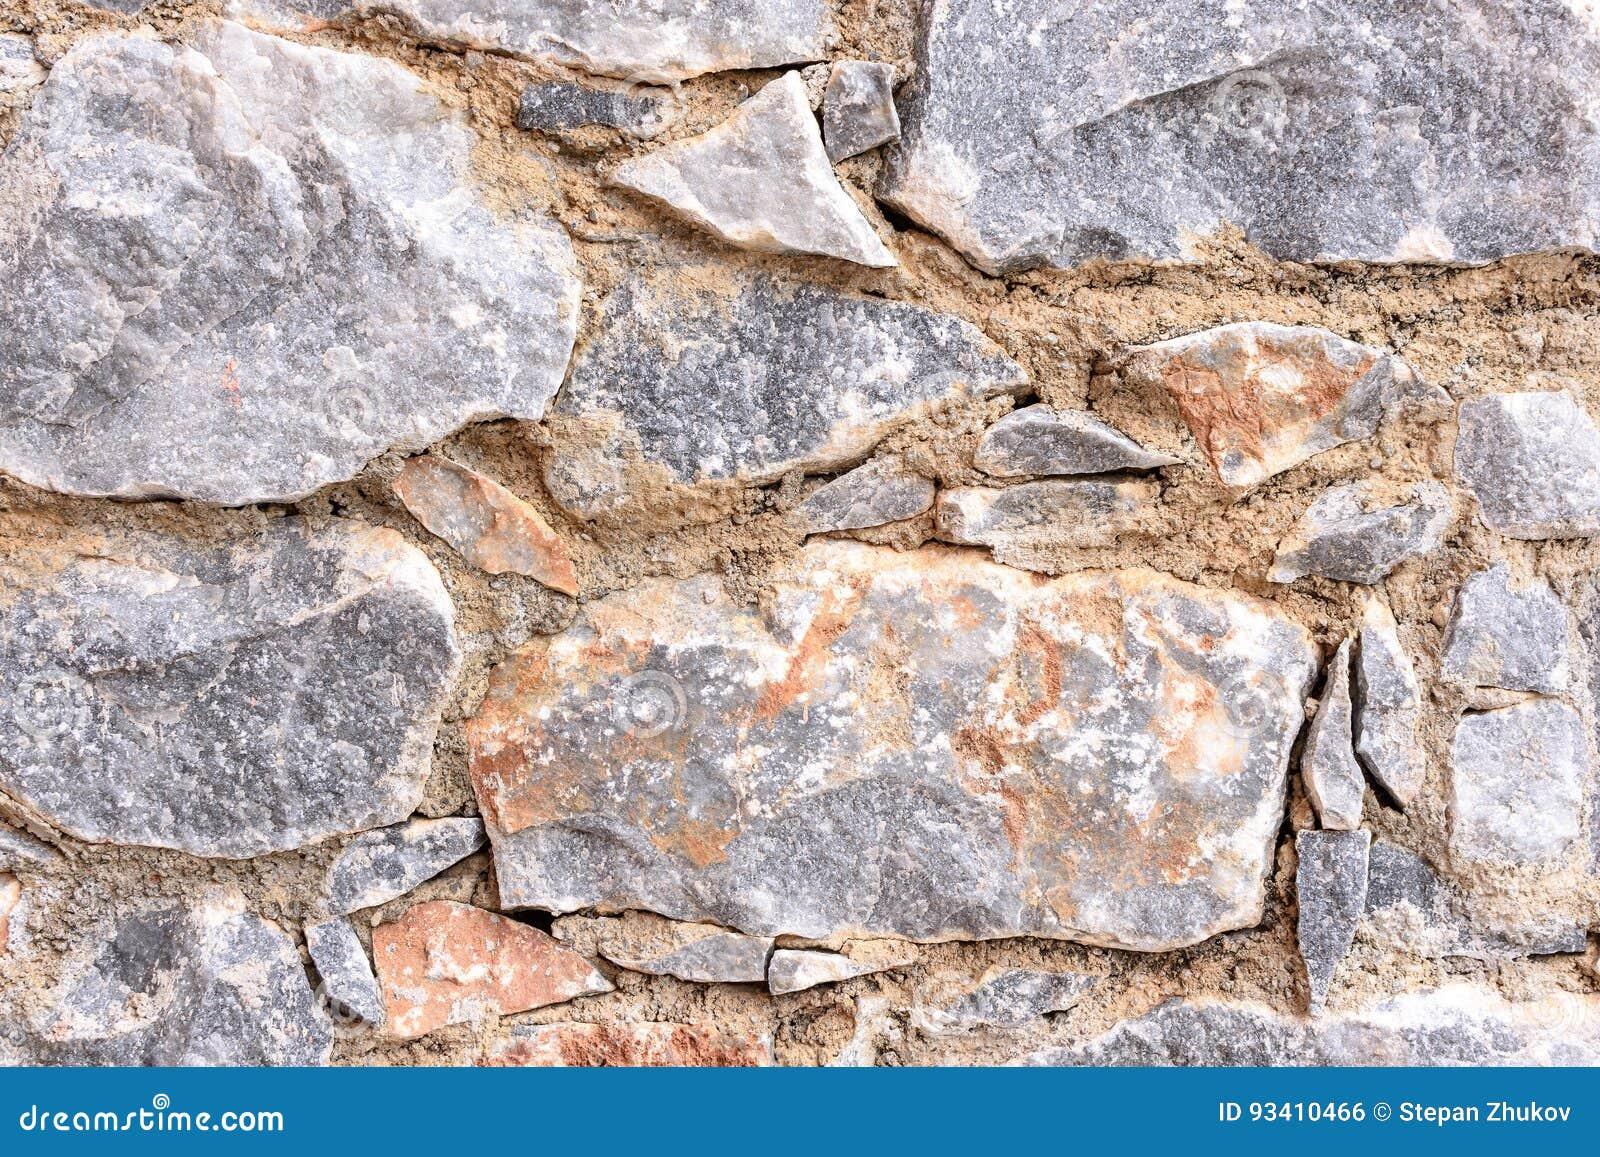 Piedra natural para paredes interiores latest trendy - Paredes piedra natural ...